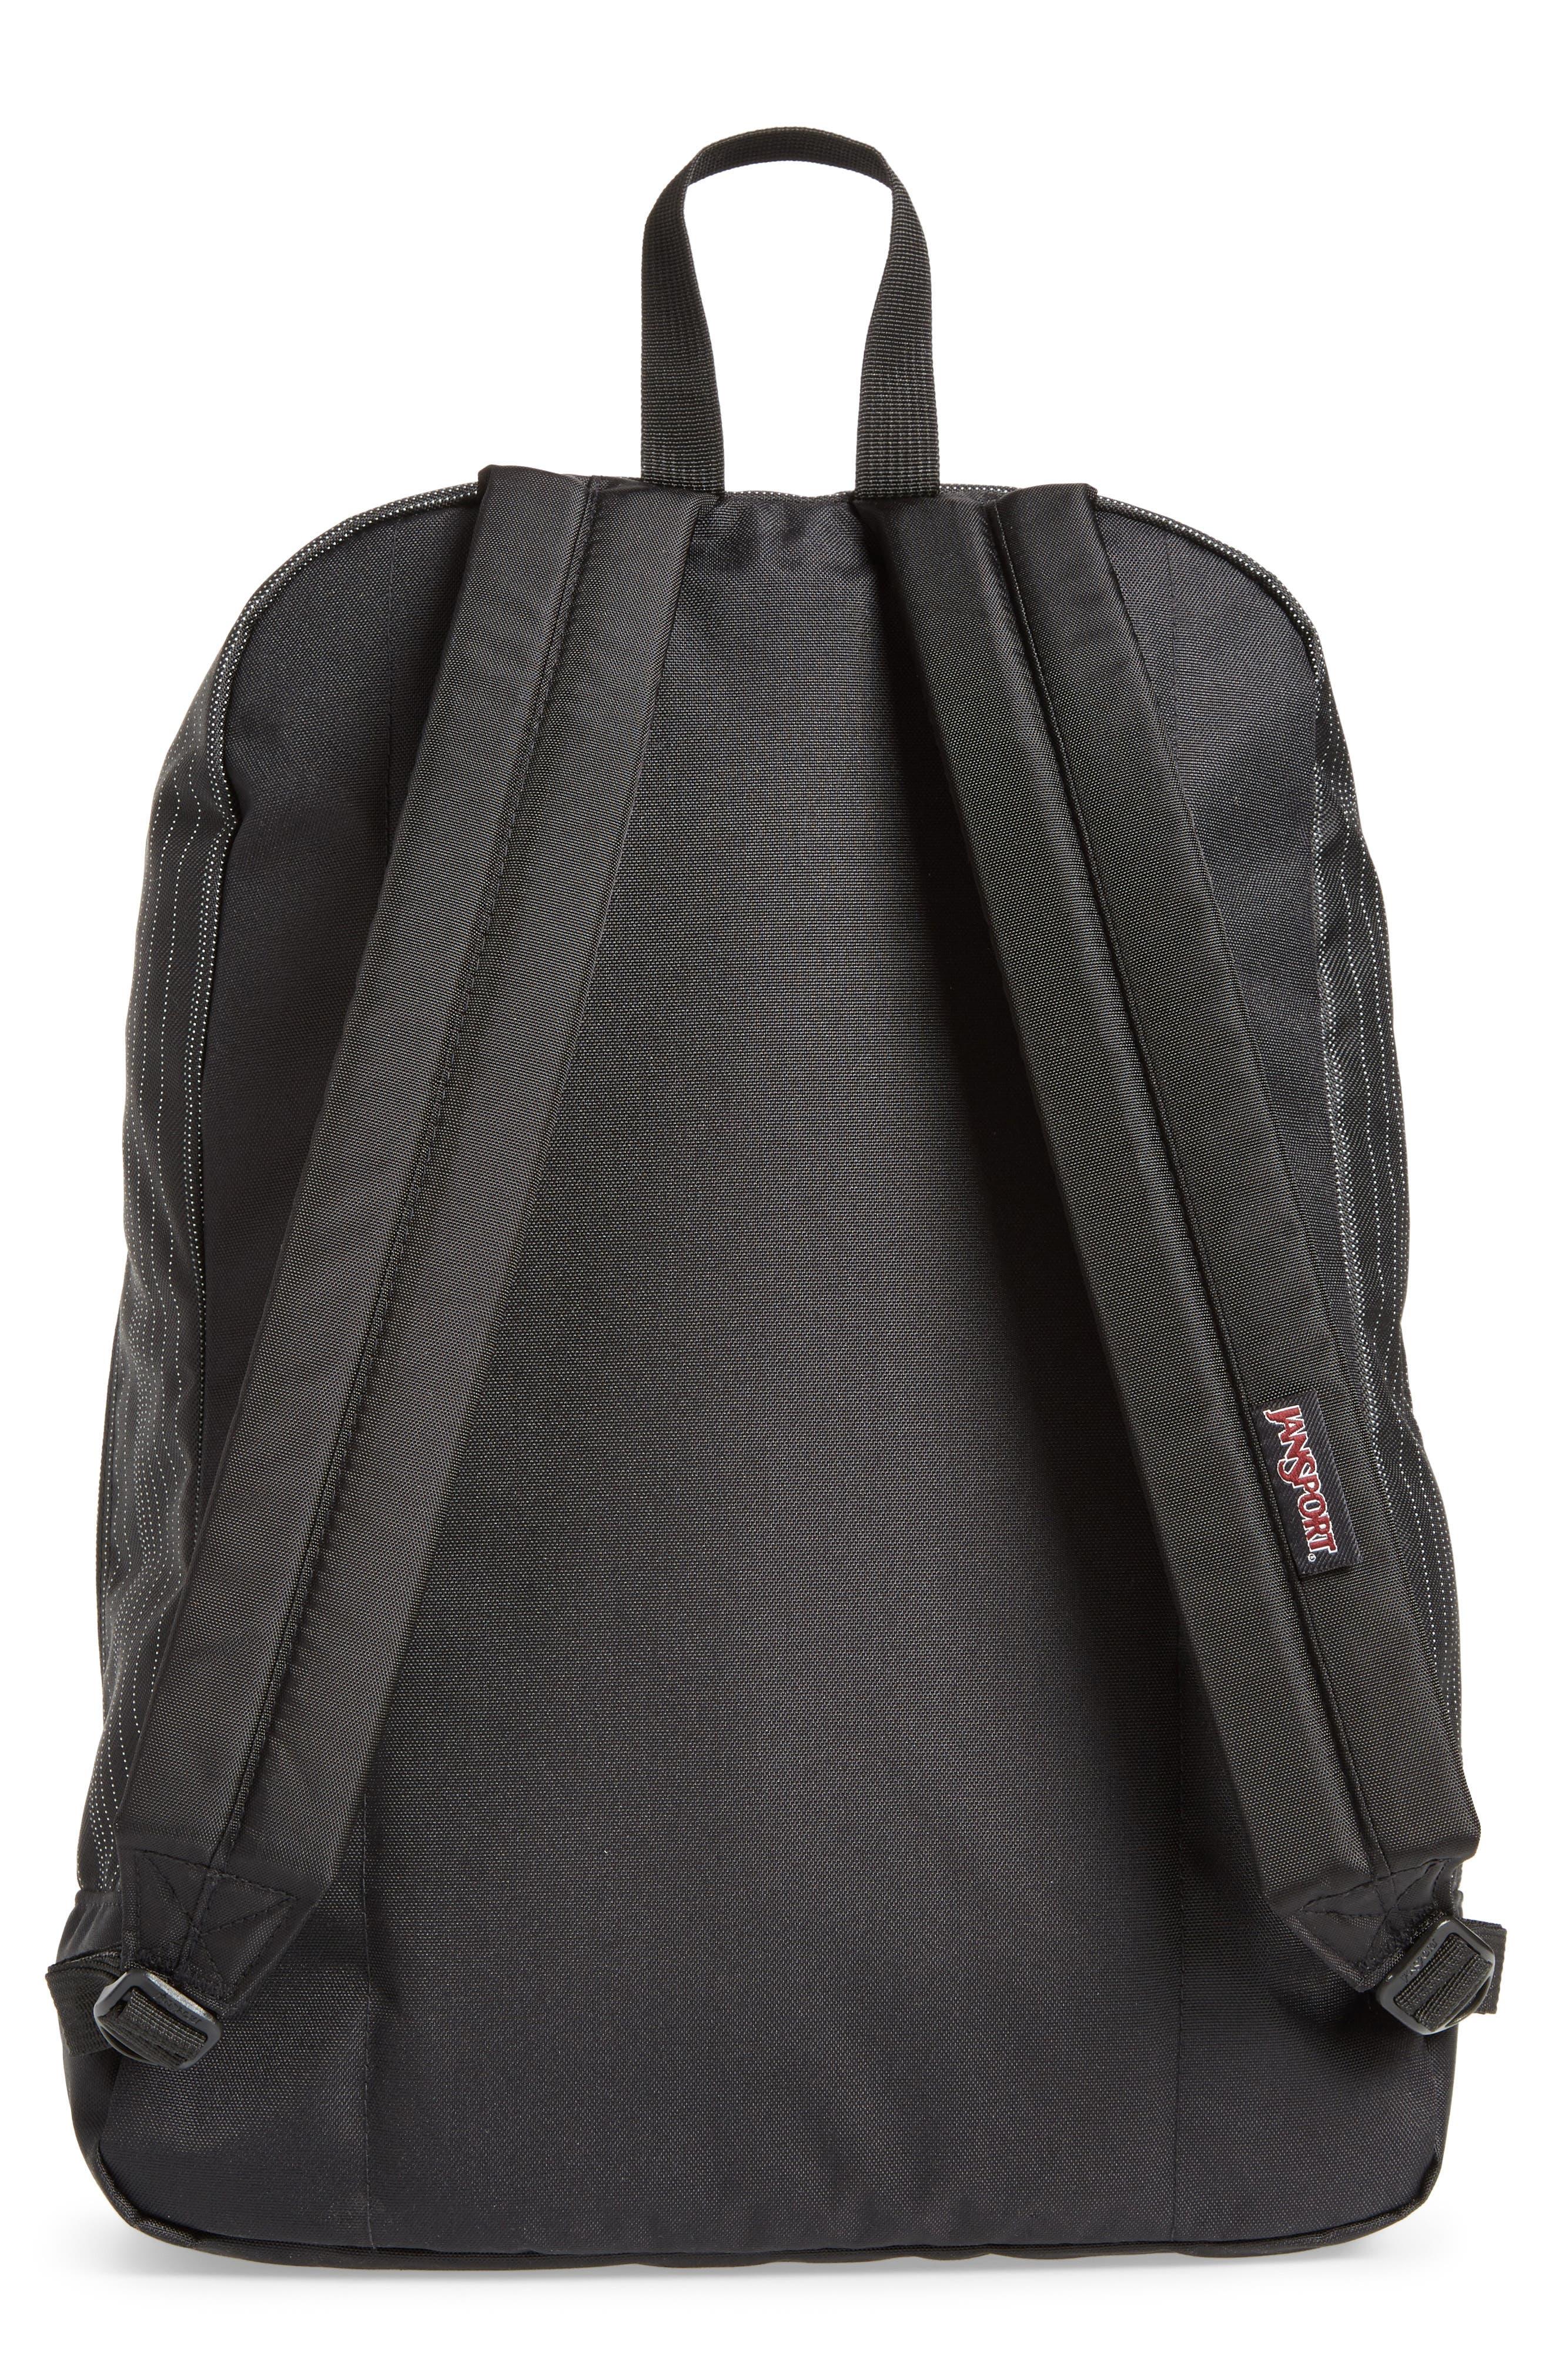 Super FX Reflective Backpack,                             Alternate thumbnail 3, color,                             020